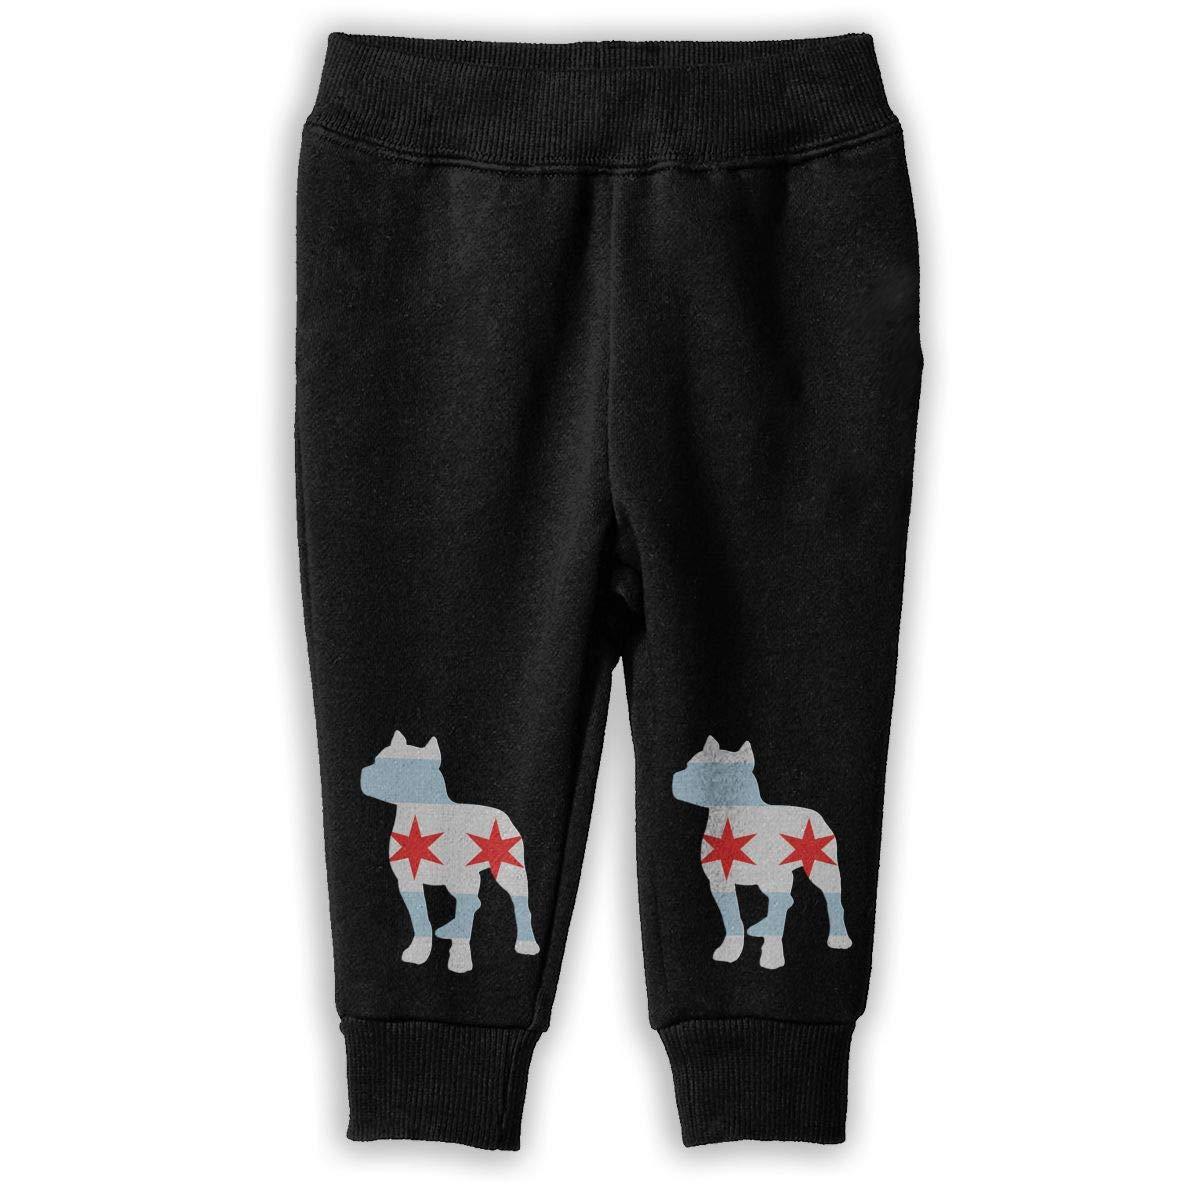 Unisex Baby Athletic Pants NJKM5MJ Patriotic Pitbull Chicago Flag Sweatpants